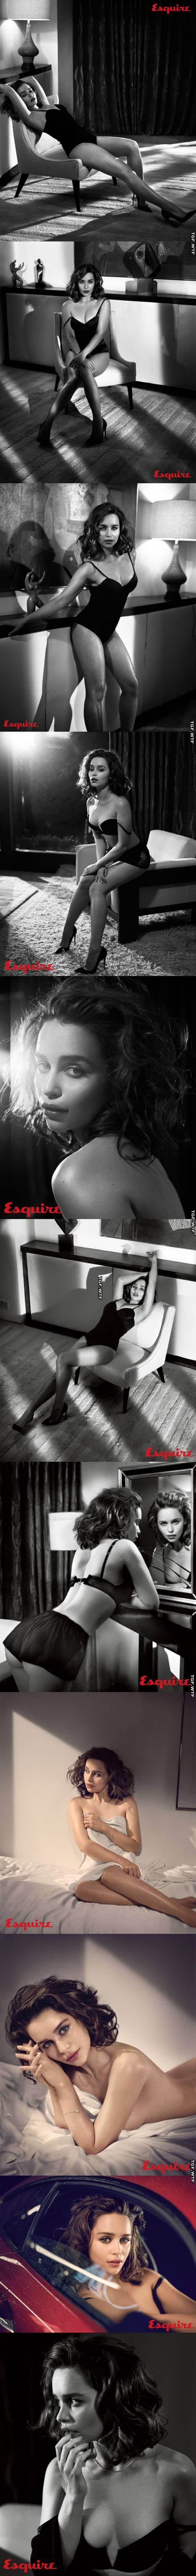 emilia-clarke-esquire-sexiest-woman (1)